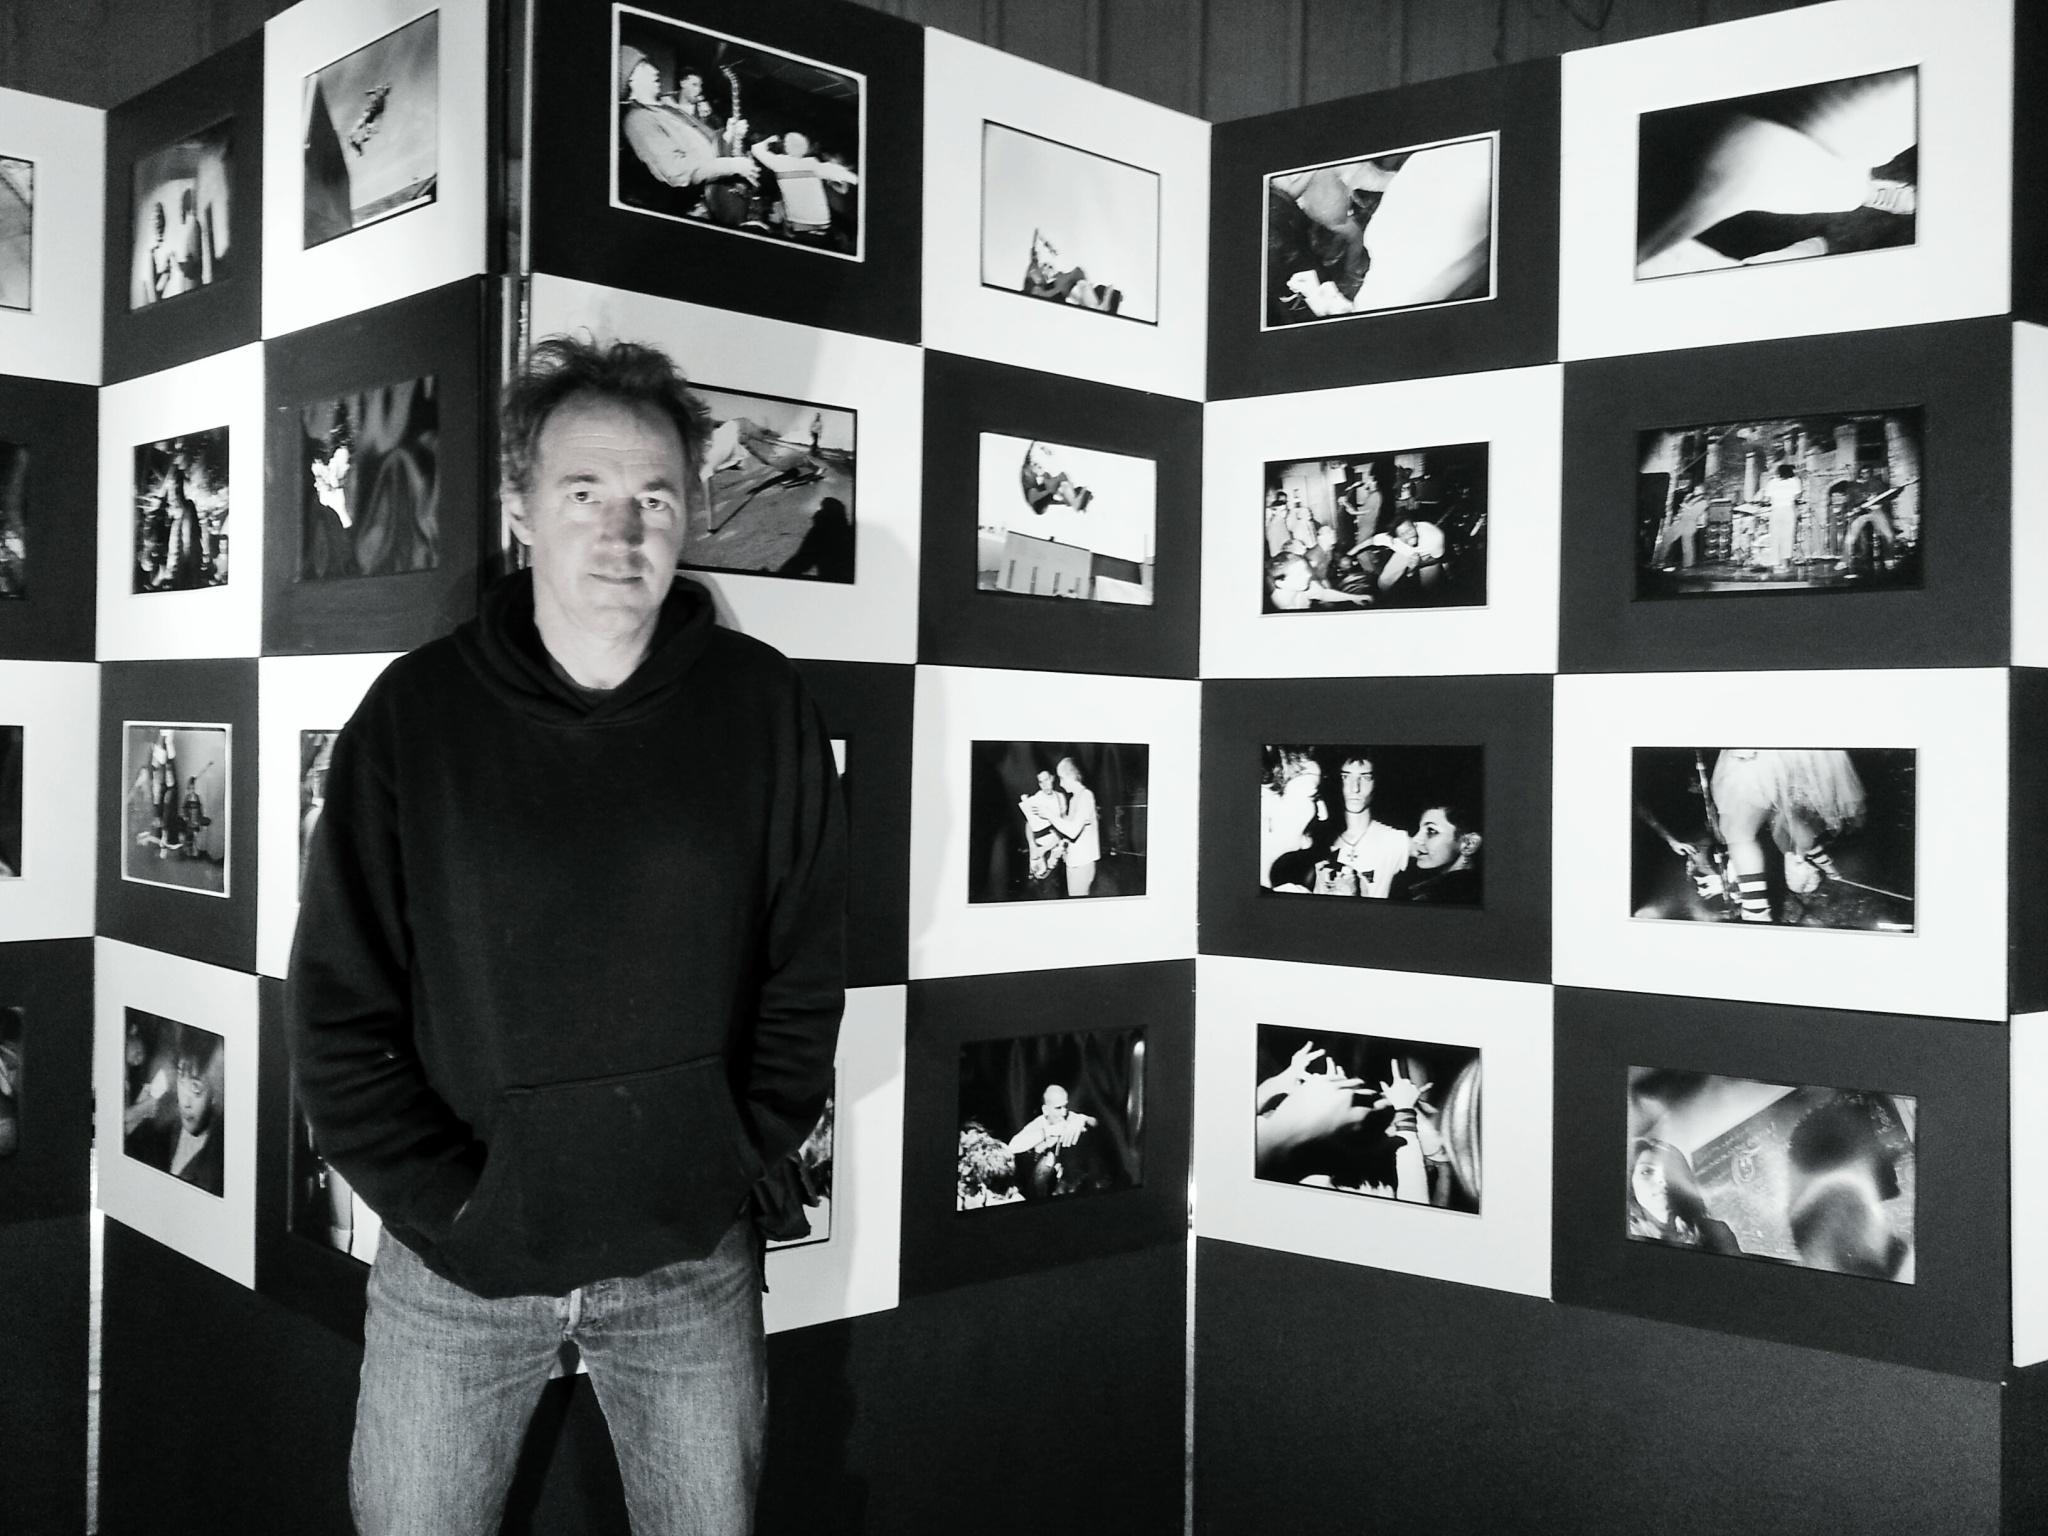 Bill Daniel with Tri-X Pop-Up Exhibit